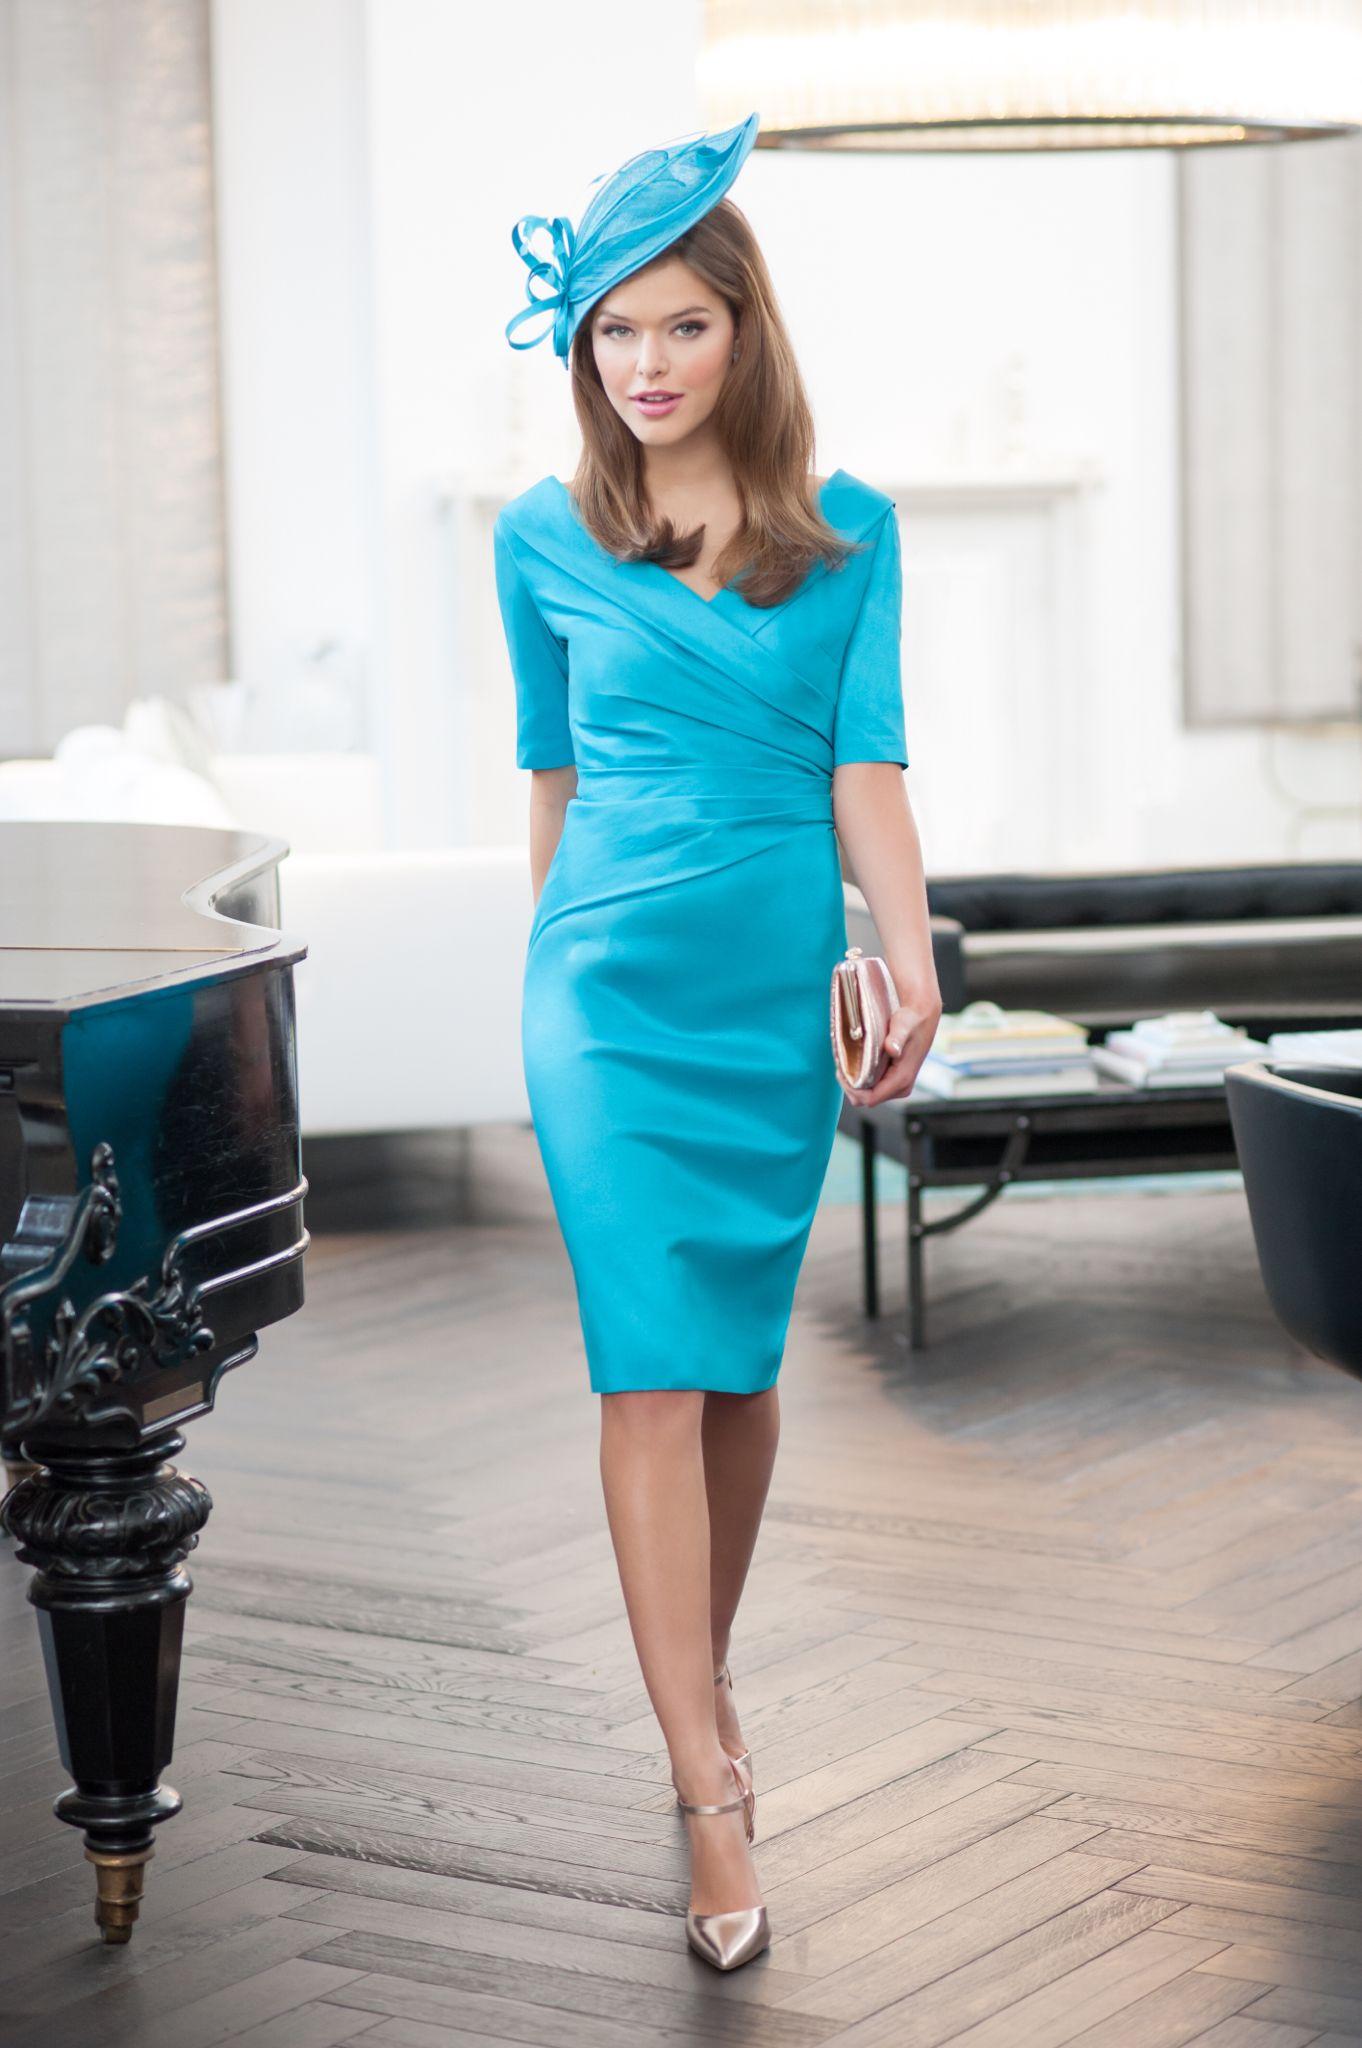 Ispirato Dress IW821 (IU821); colours Rivera; Kingfisher